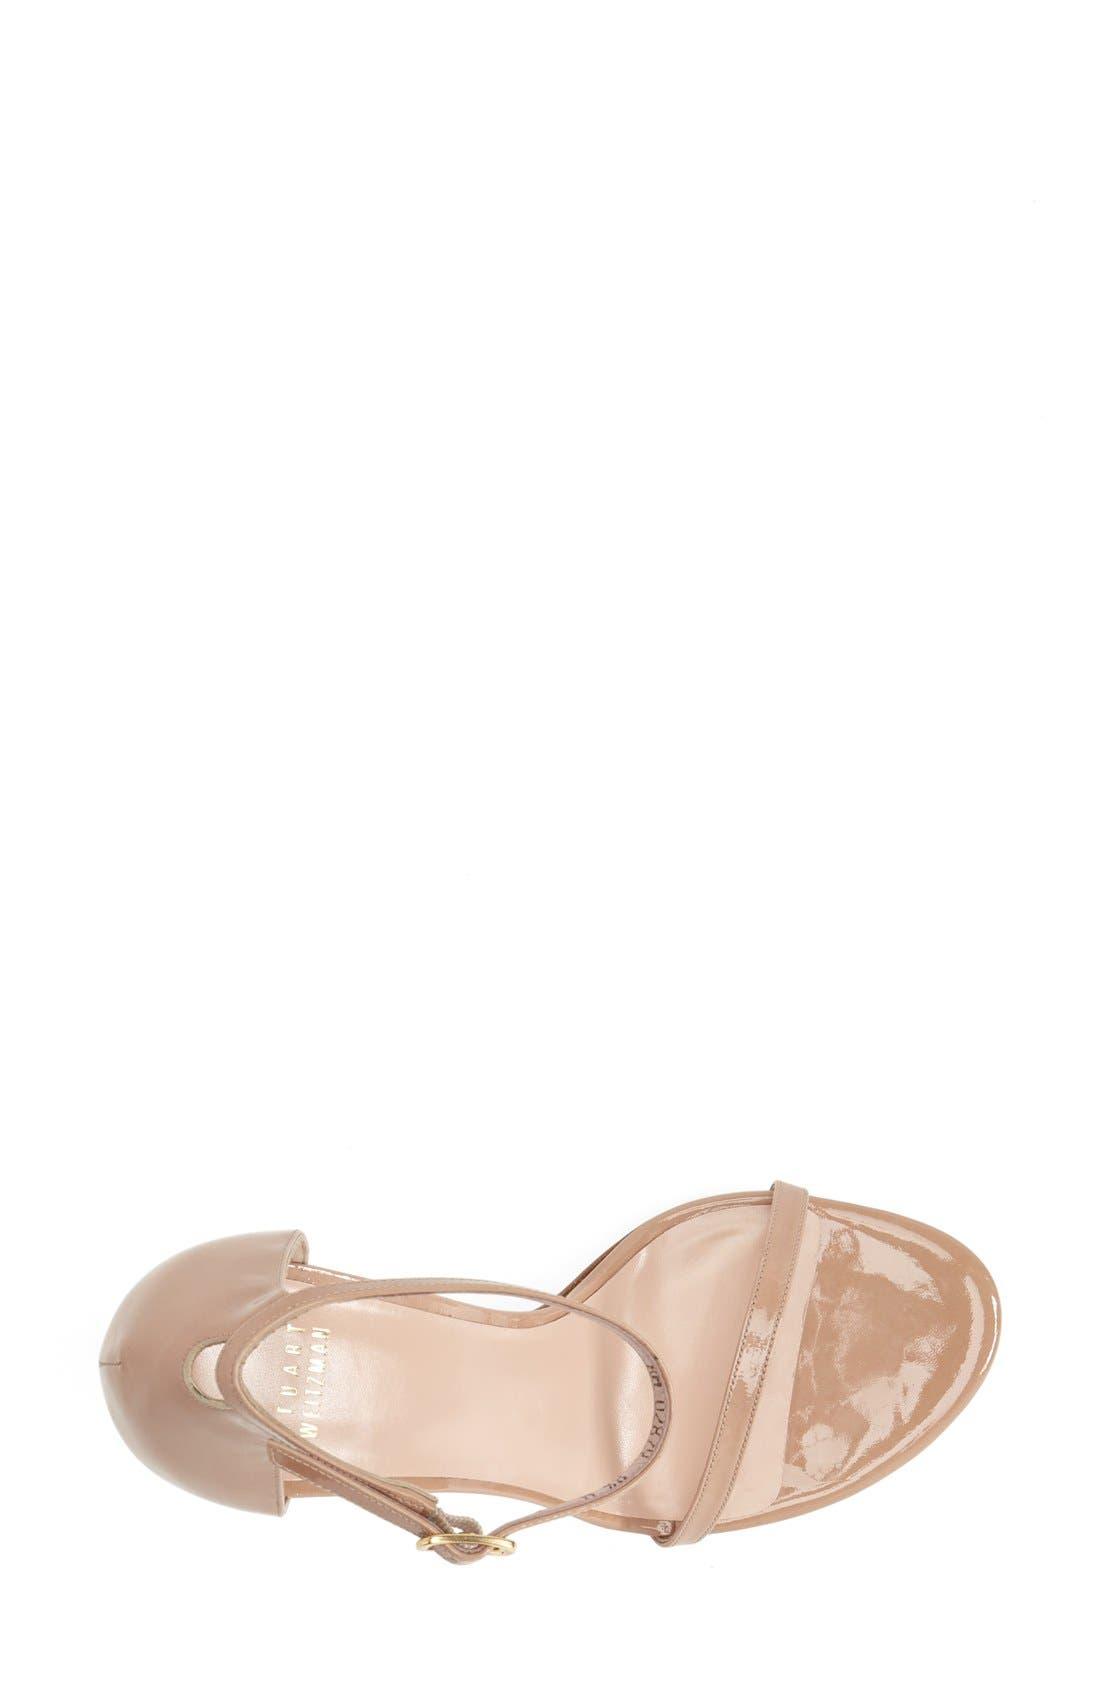 Alternate Image 3  - Stuart Weitzman Nudistsong Ankle Strap Sandal (Women)